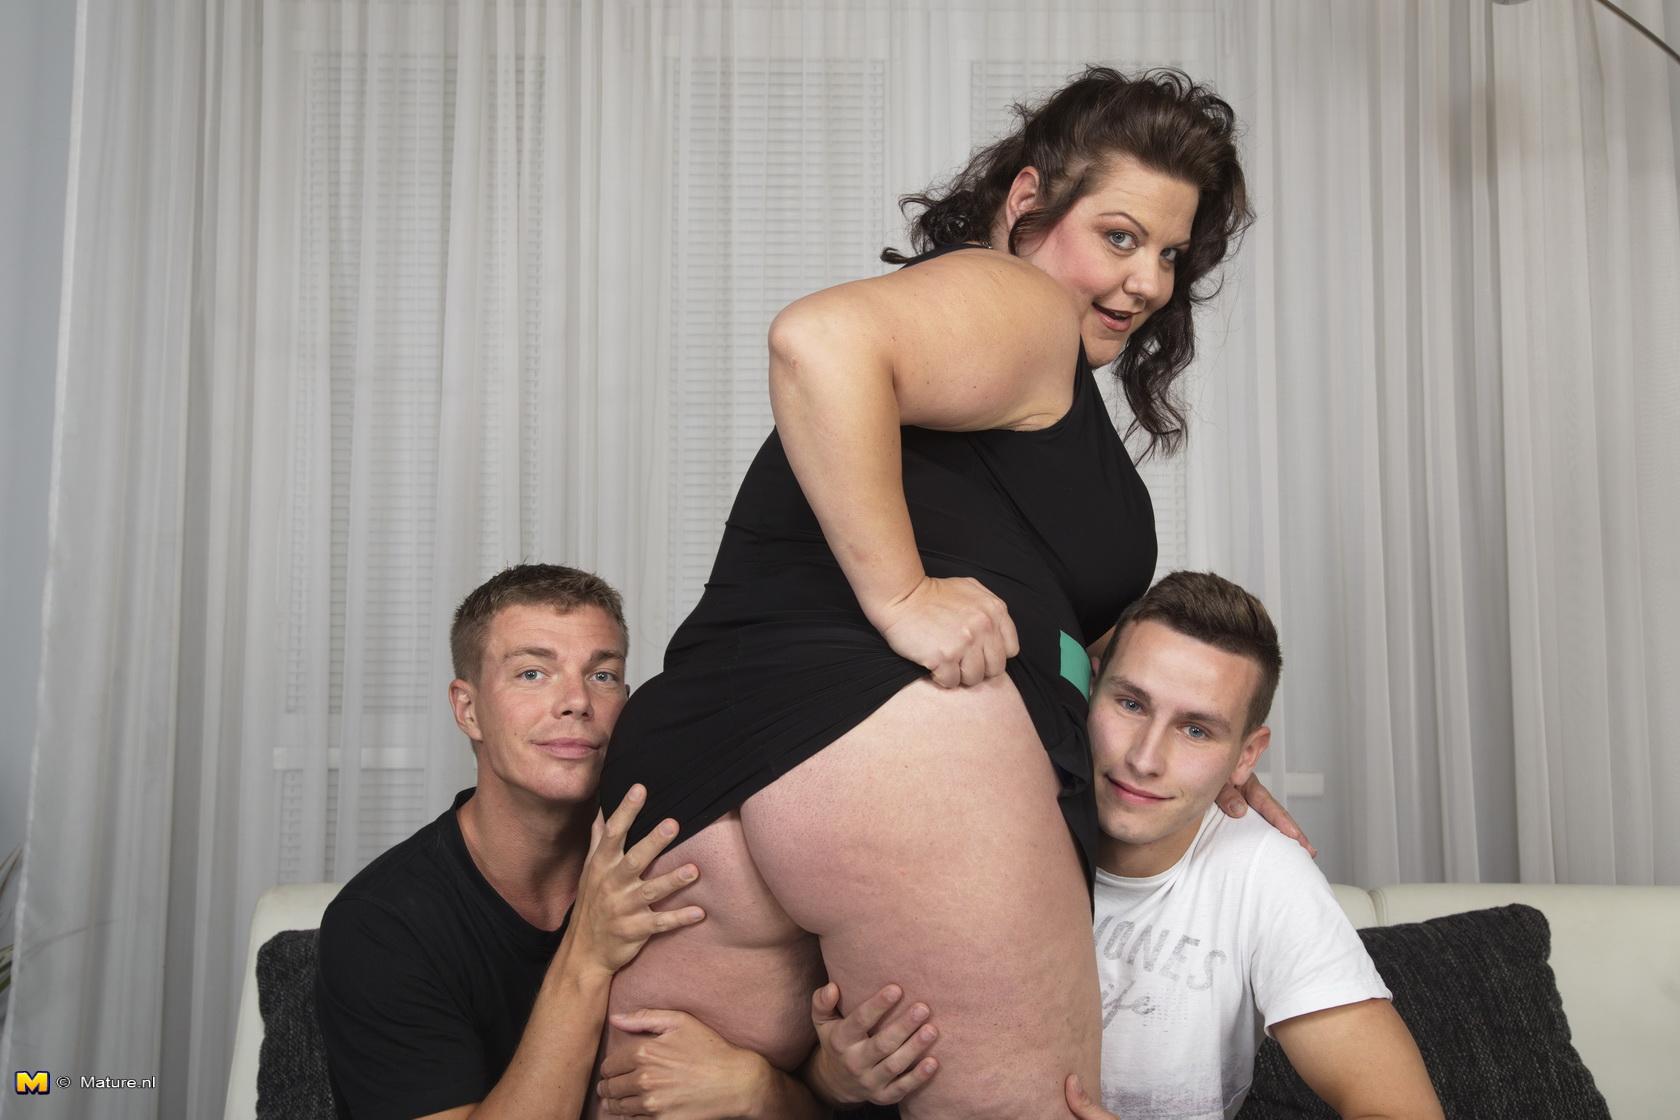 Threesome Two Girls One Boy